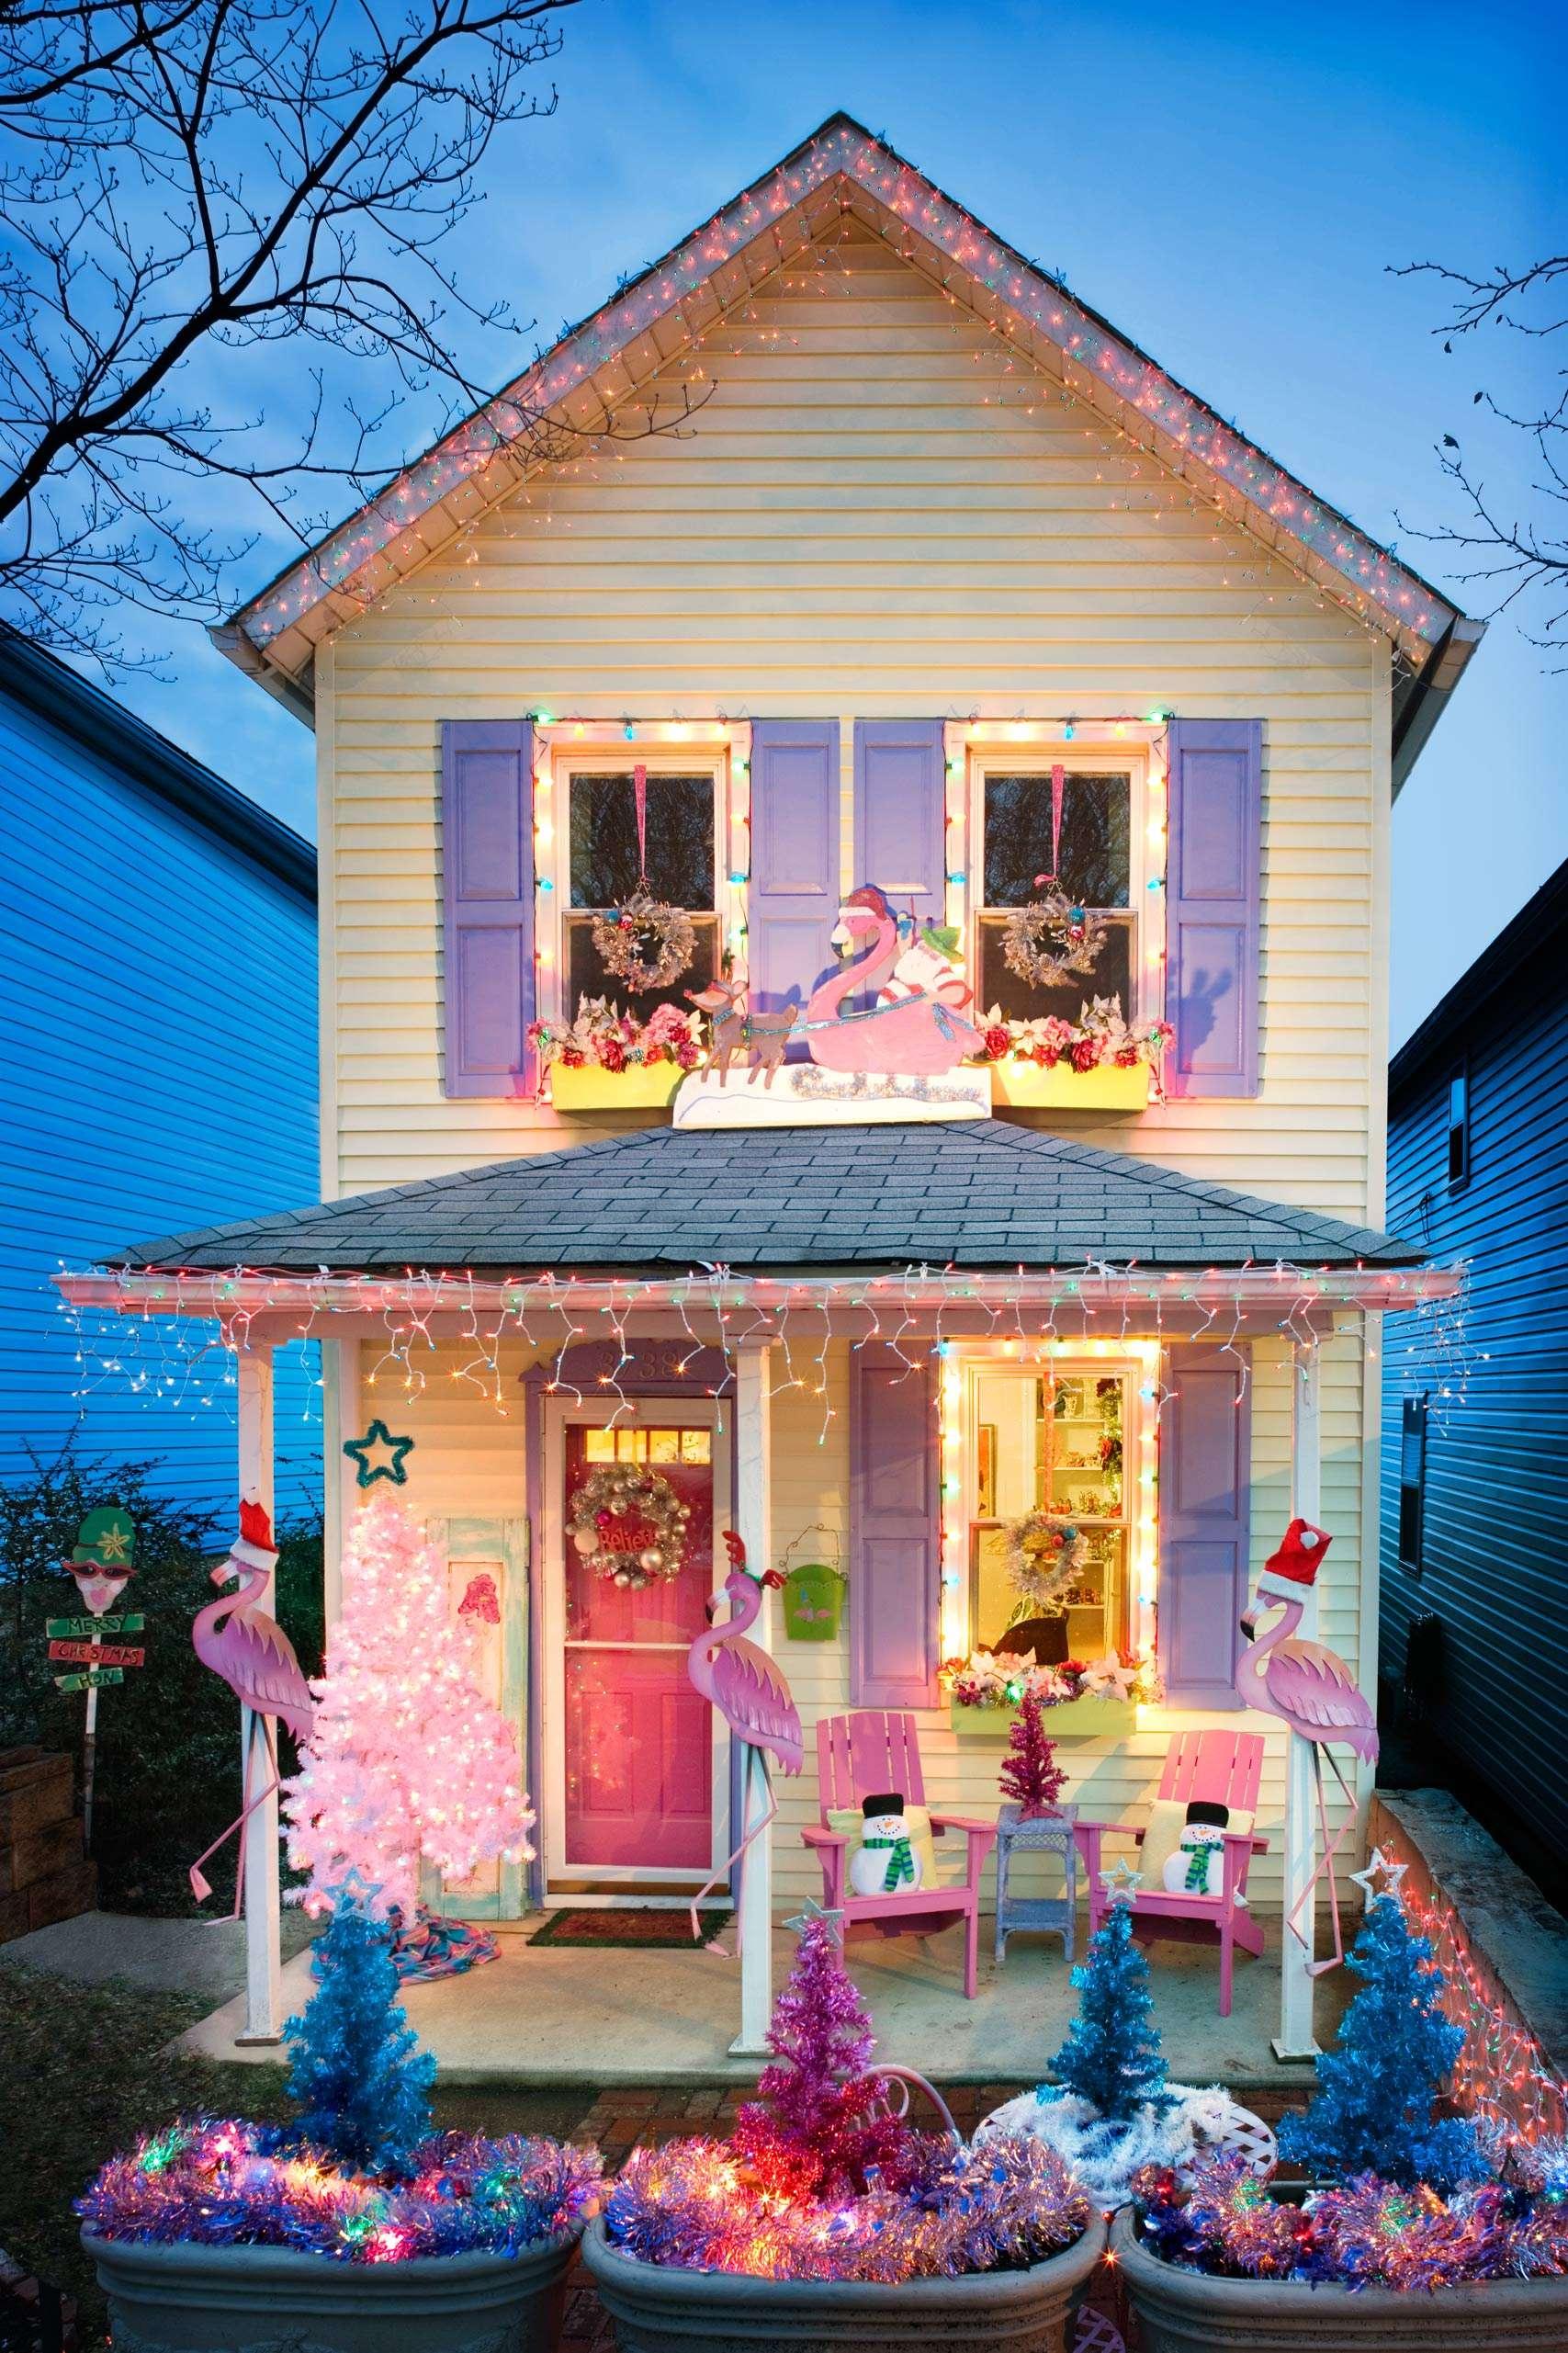 PORTFOLIO - Baltimore - Neighborhoods   #19  Hampden House with Christmas Decorations